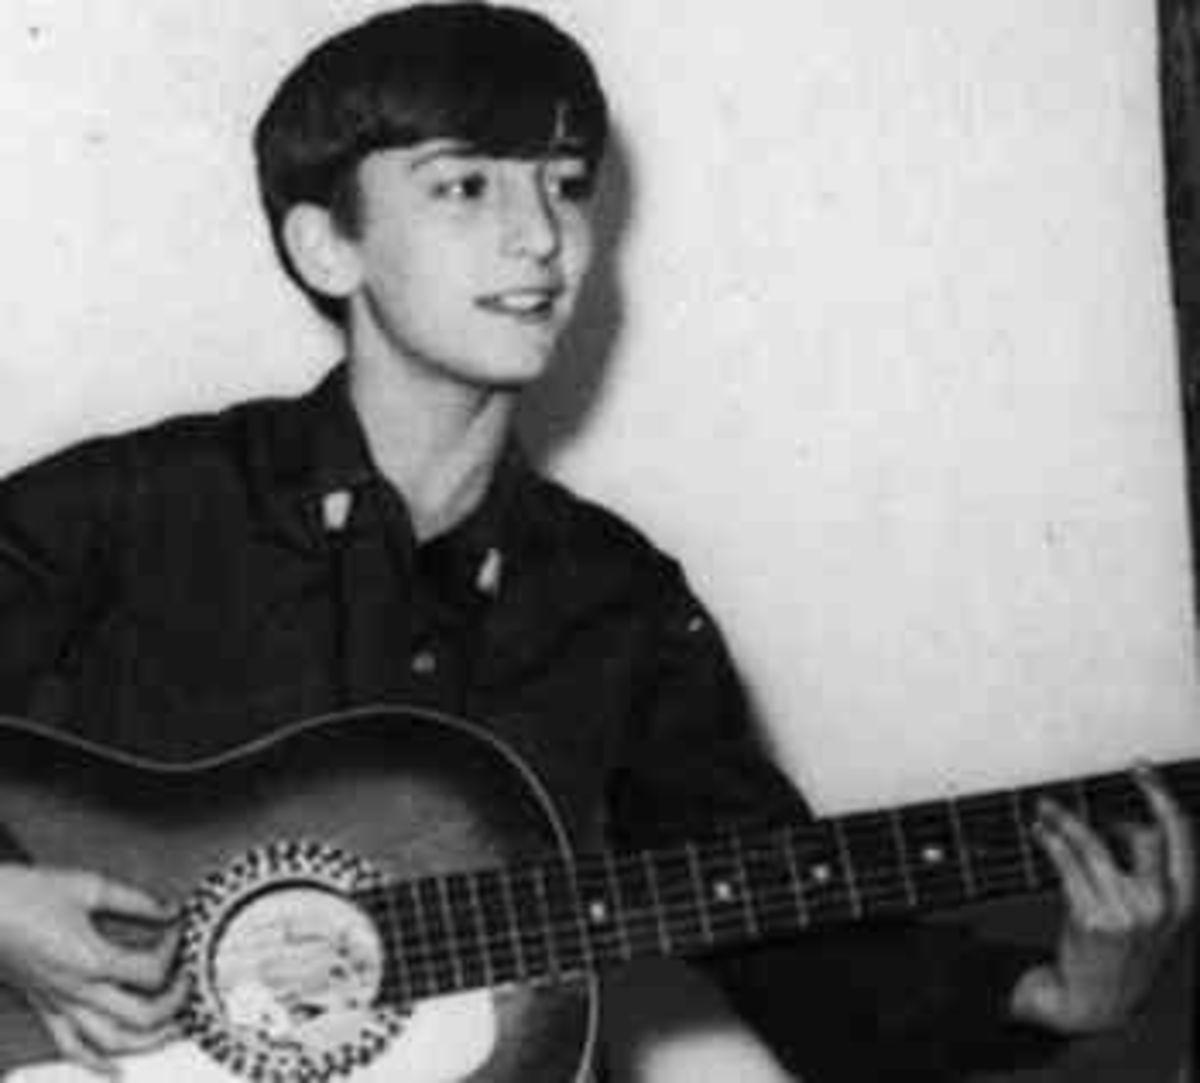 A young John Lennon.